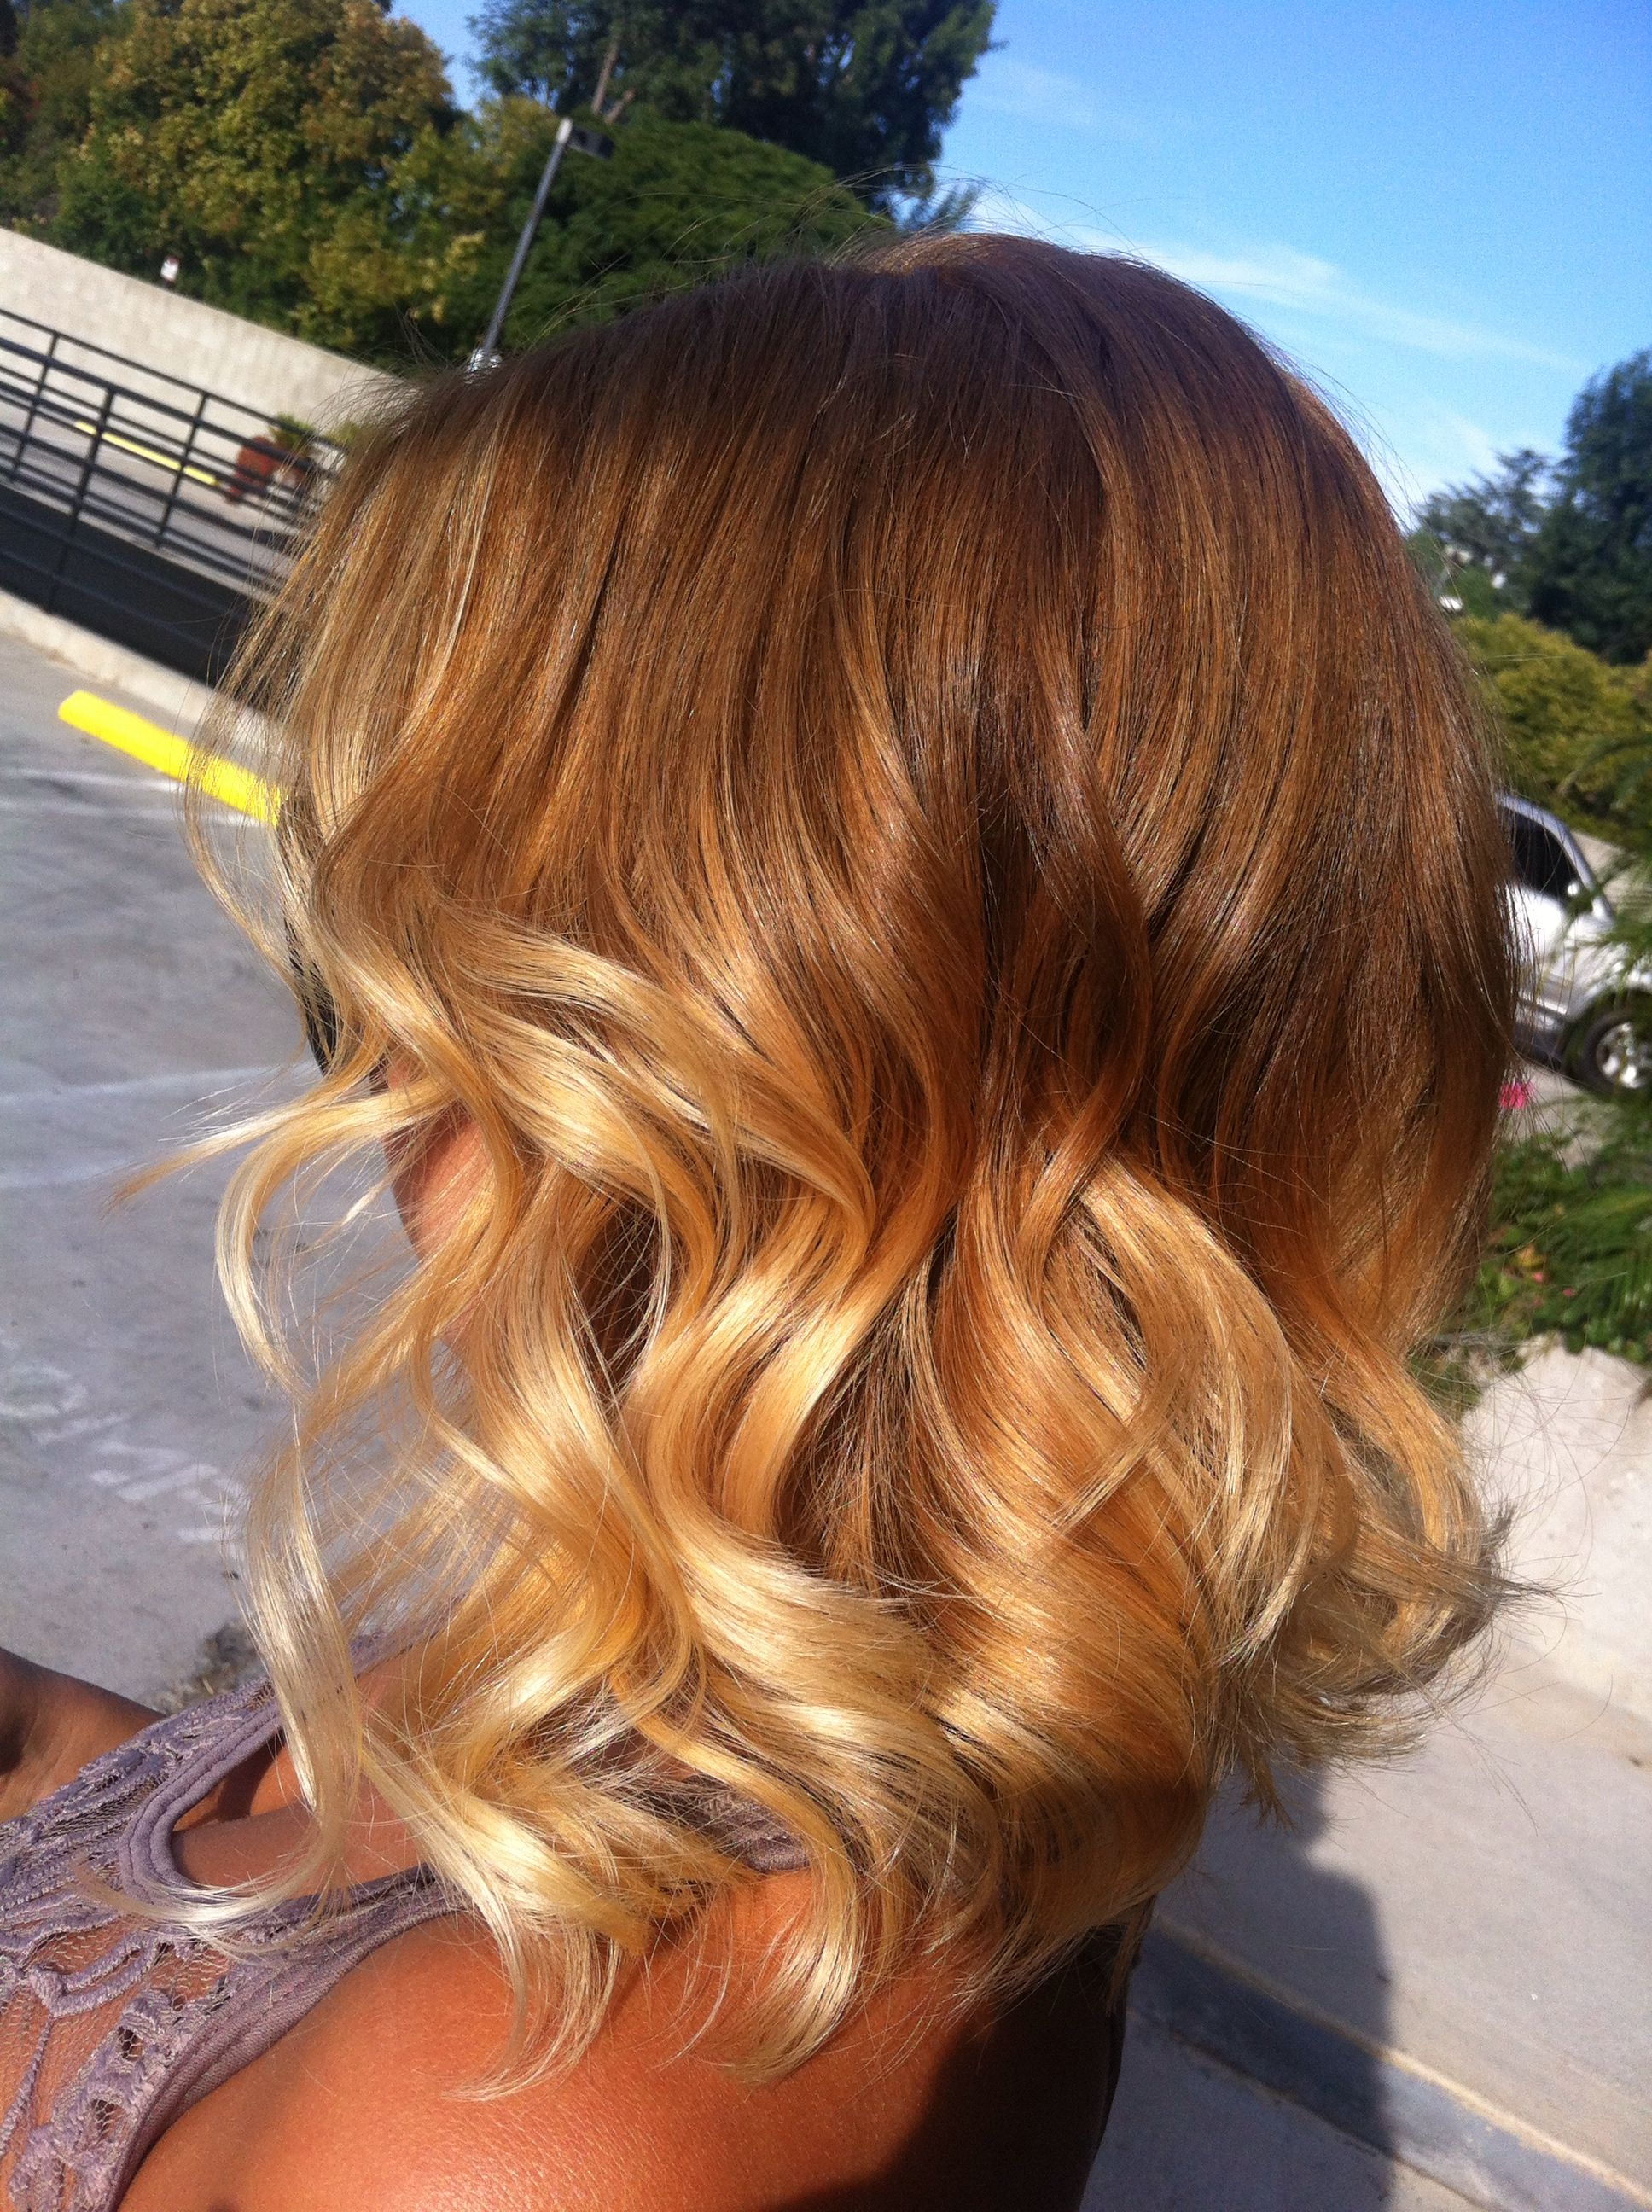 Short Hair Ombré Blonde Hair Trendfarben Haare 2016 Pinterest